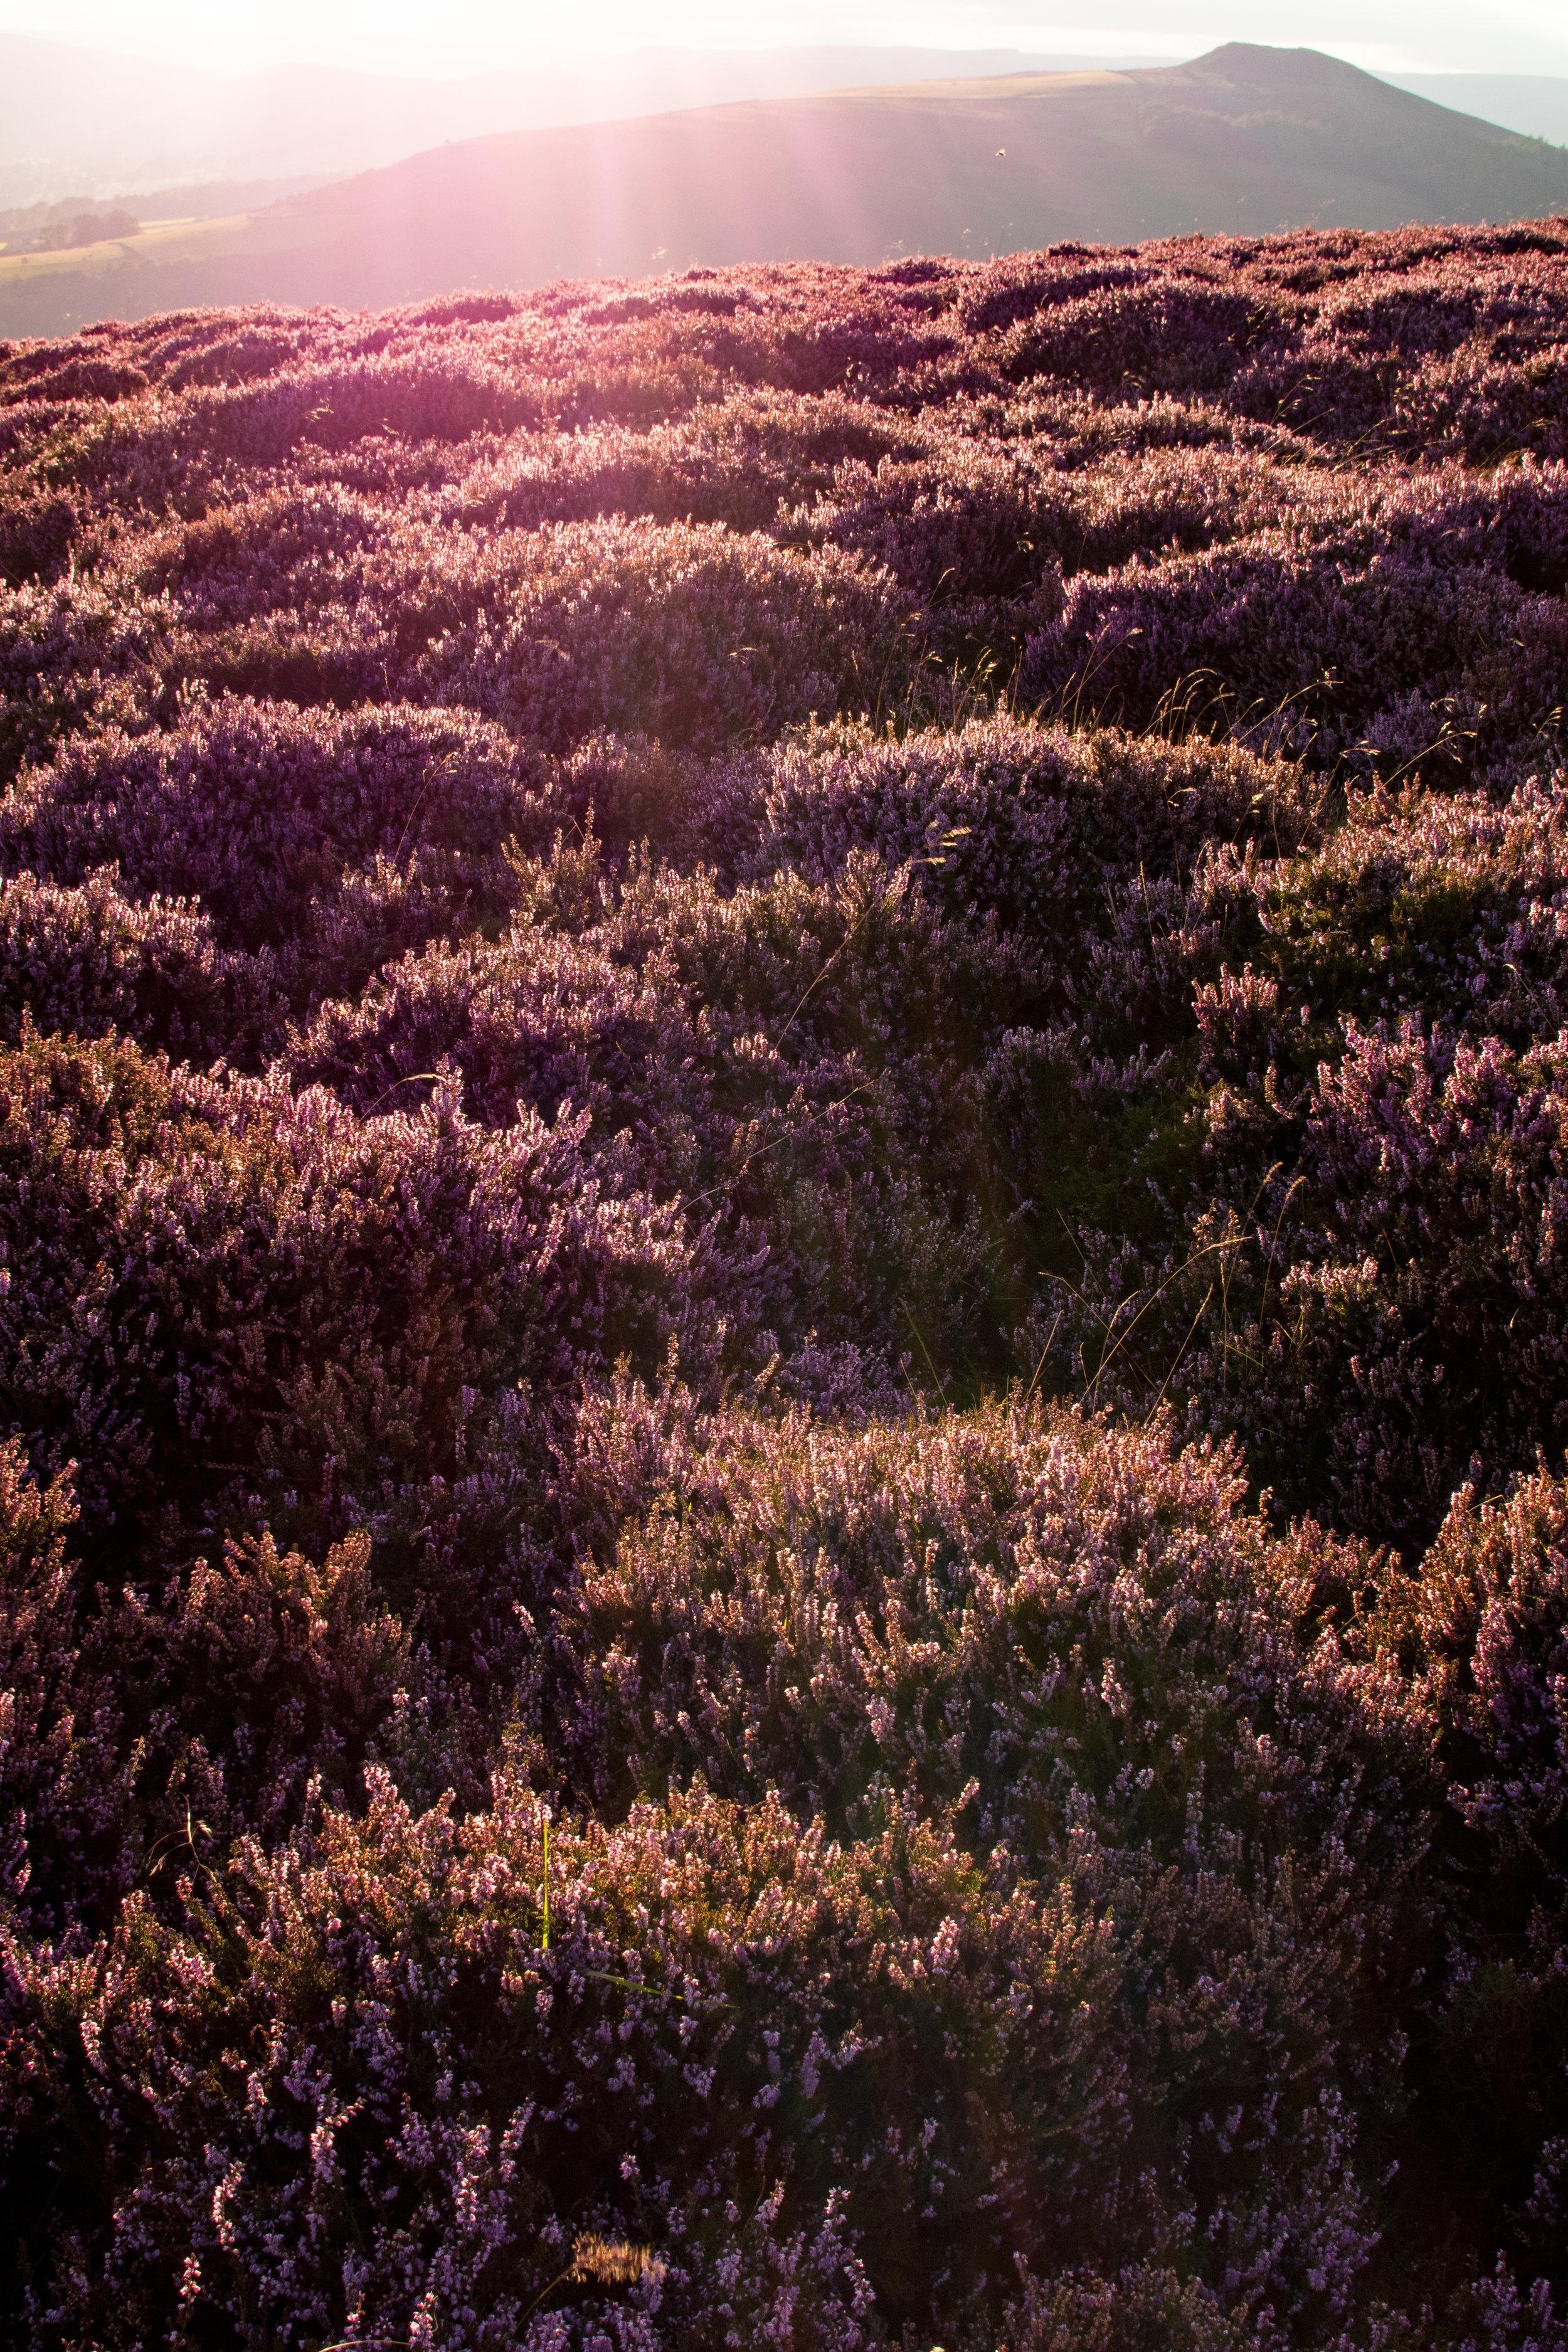 SUNSET HEATHER AT BAMFORD EDGE